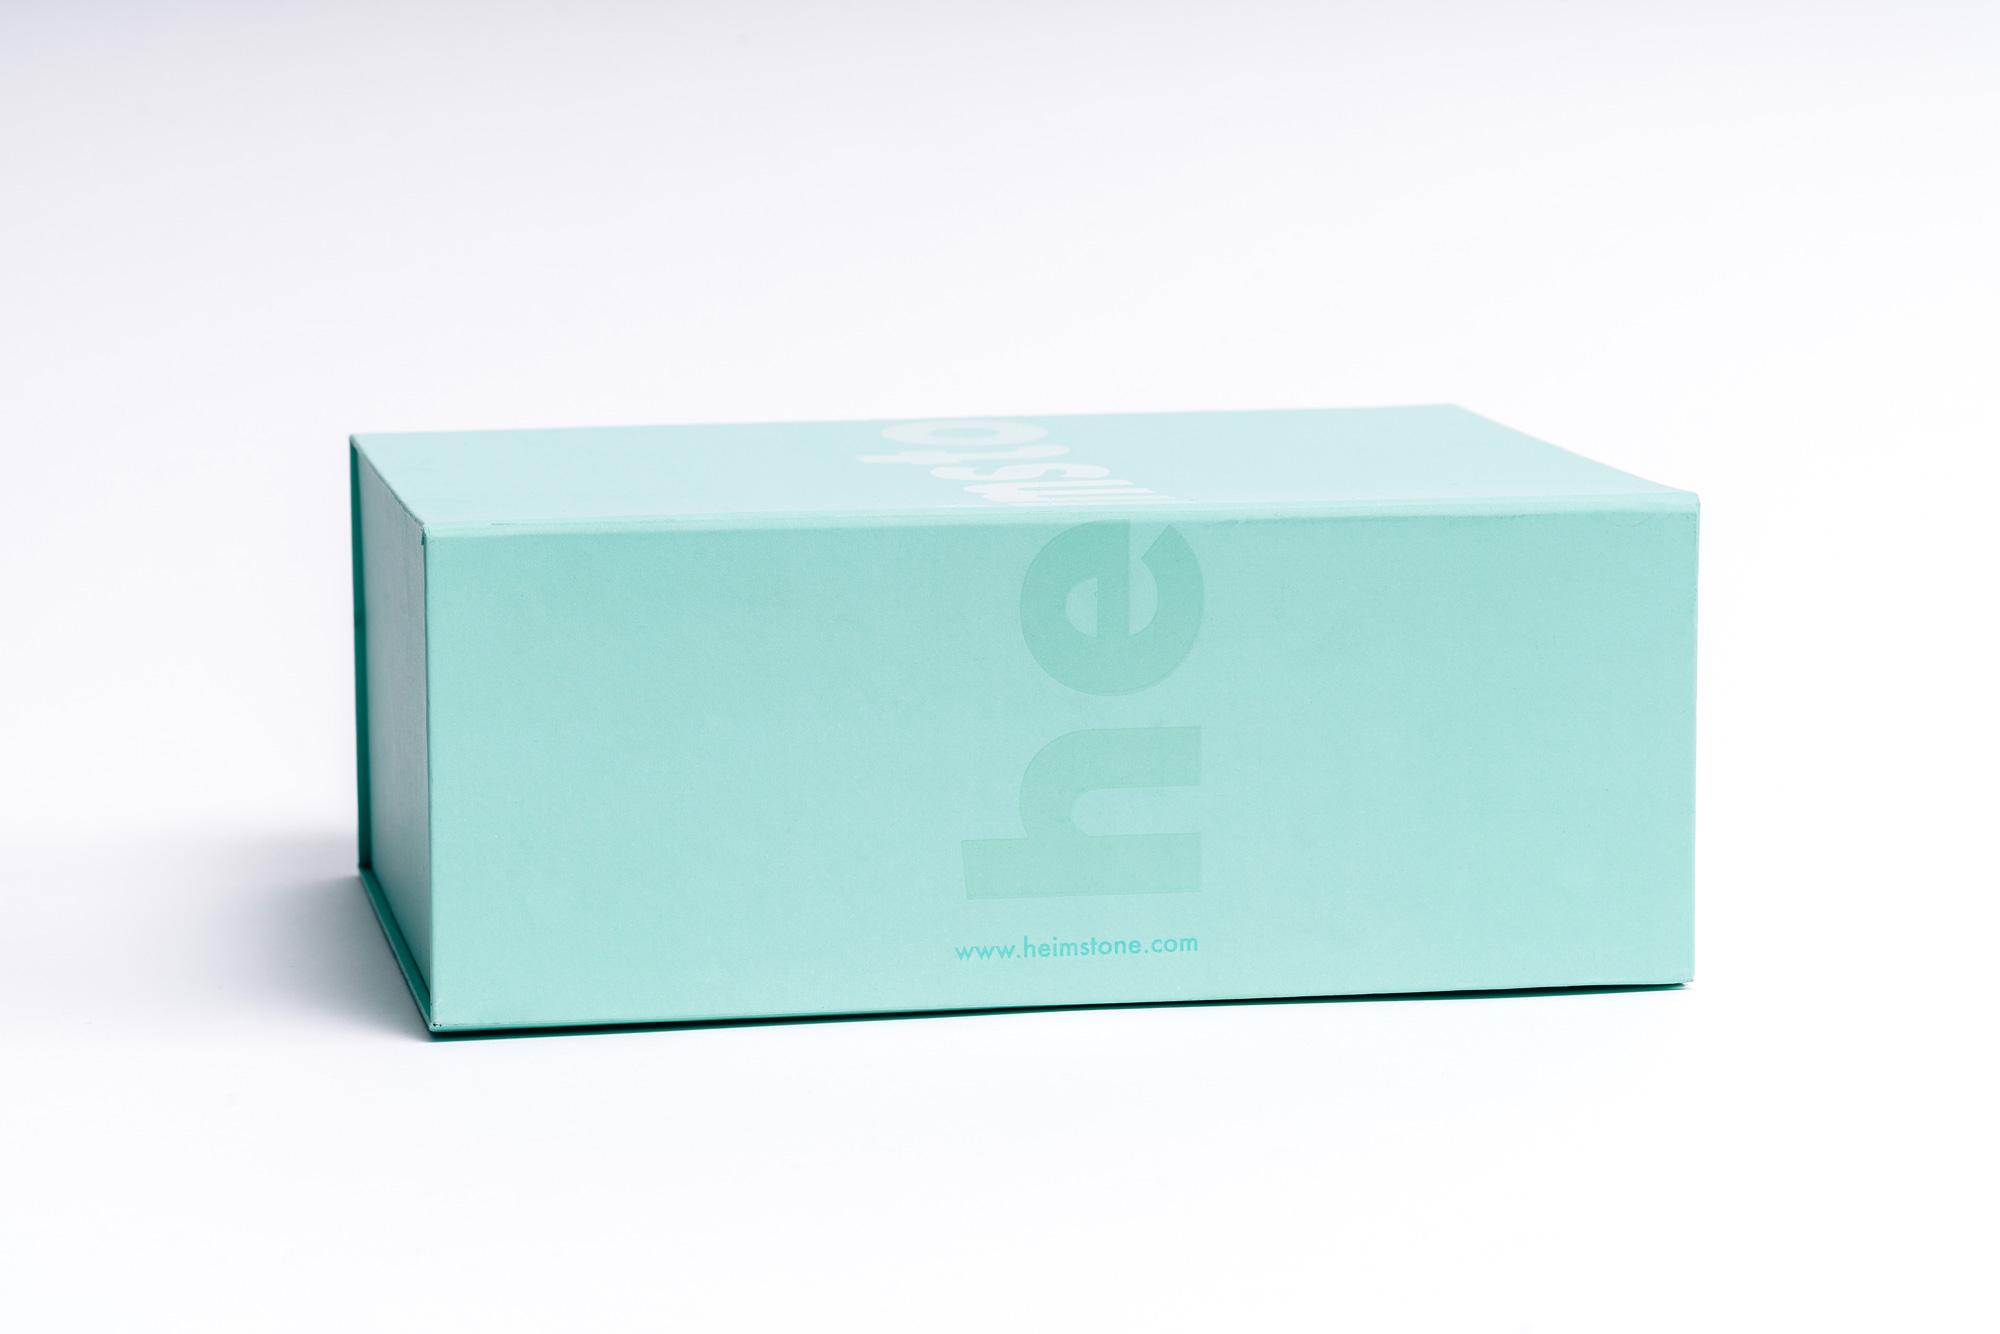 hesimtone-shoe-box.jpg